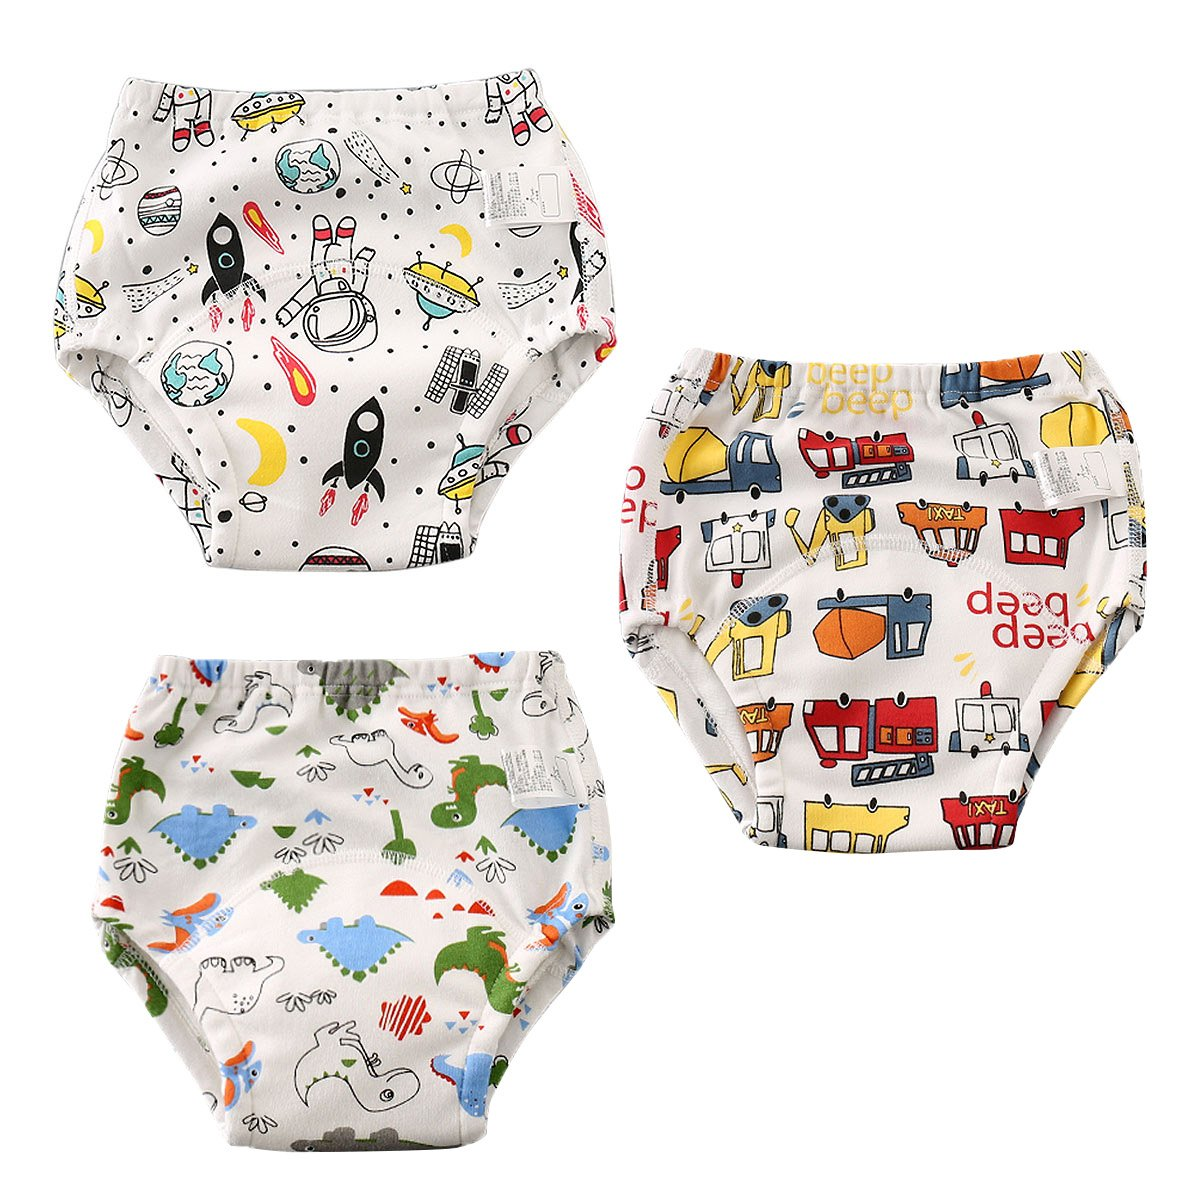 Aolawu Baby Traininghose Waschbar Trainerhosen Baumwolle Windelhose Toilettentraining Unterhose Set Wiederverwendbar Lernwindel-100